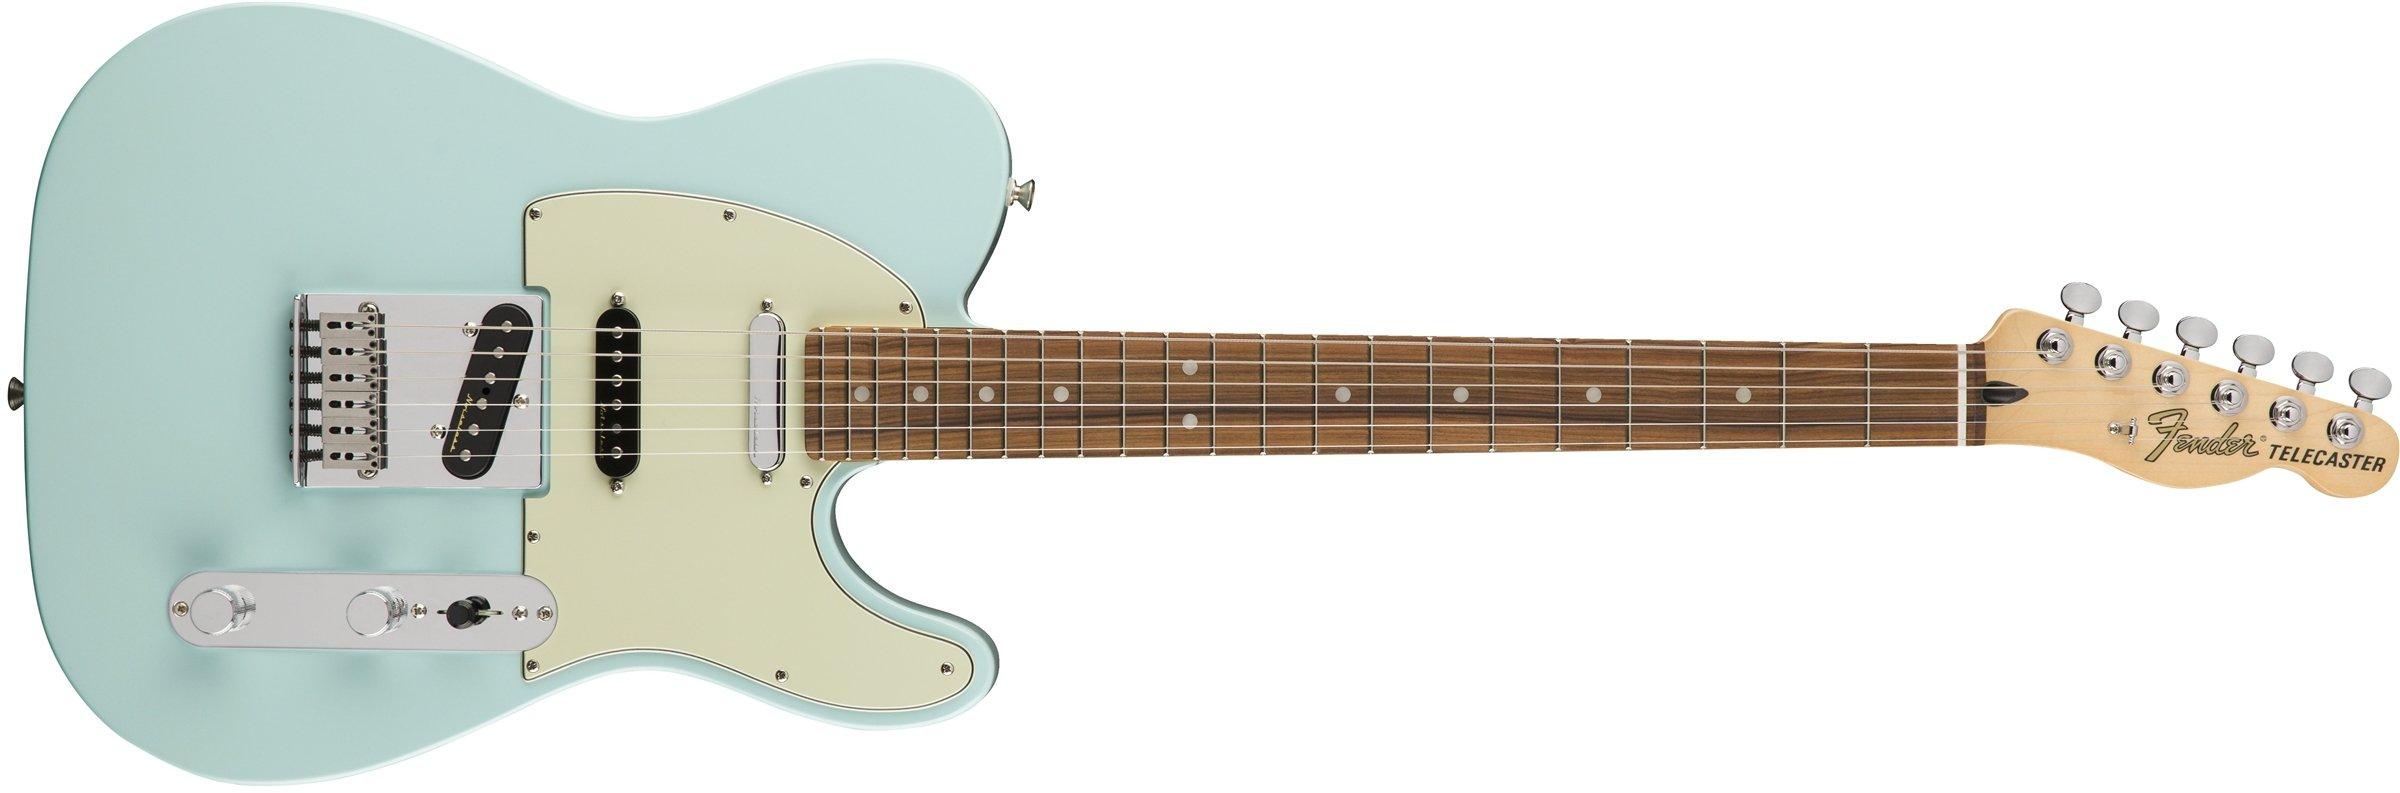 Cheap Fender Deluxe Nashville Telecaster Electric Guitar - Pau Ferro Fingerboard - Daphne Blue Black Friday & Cyber Monday 2019